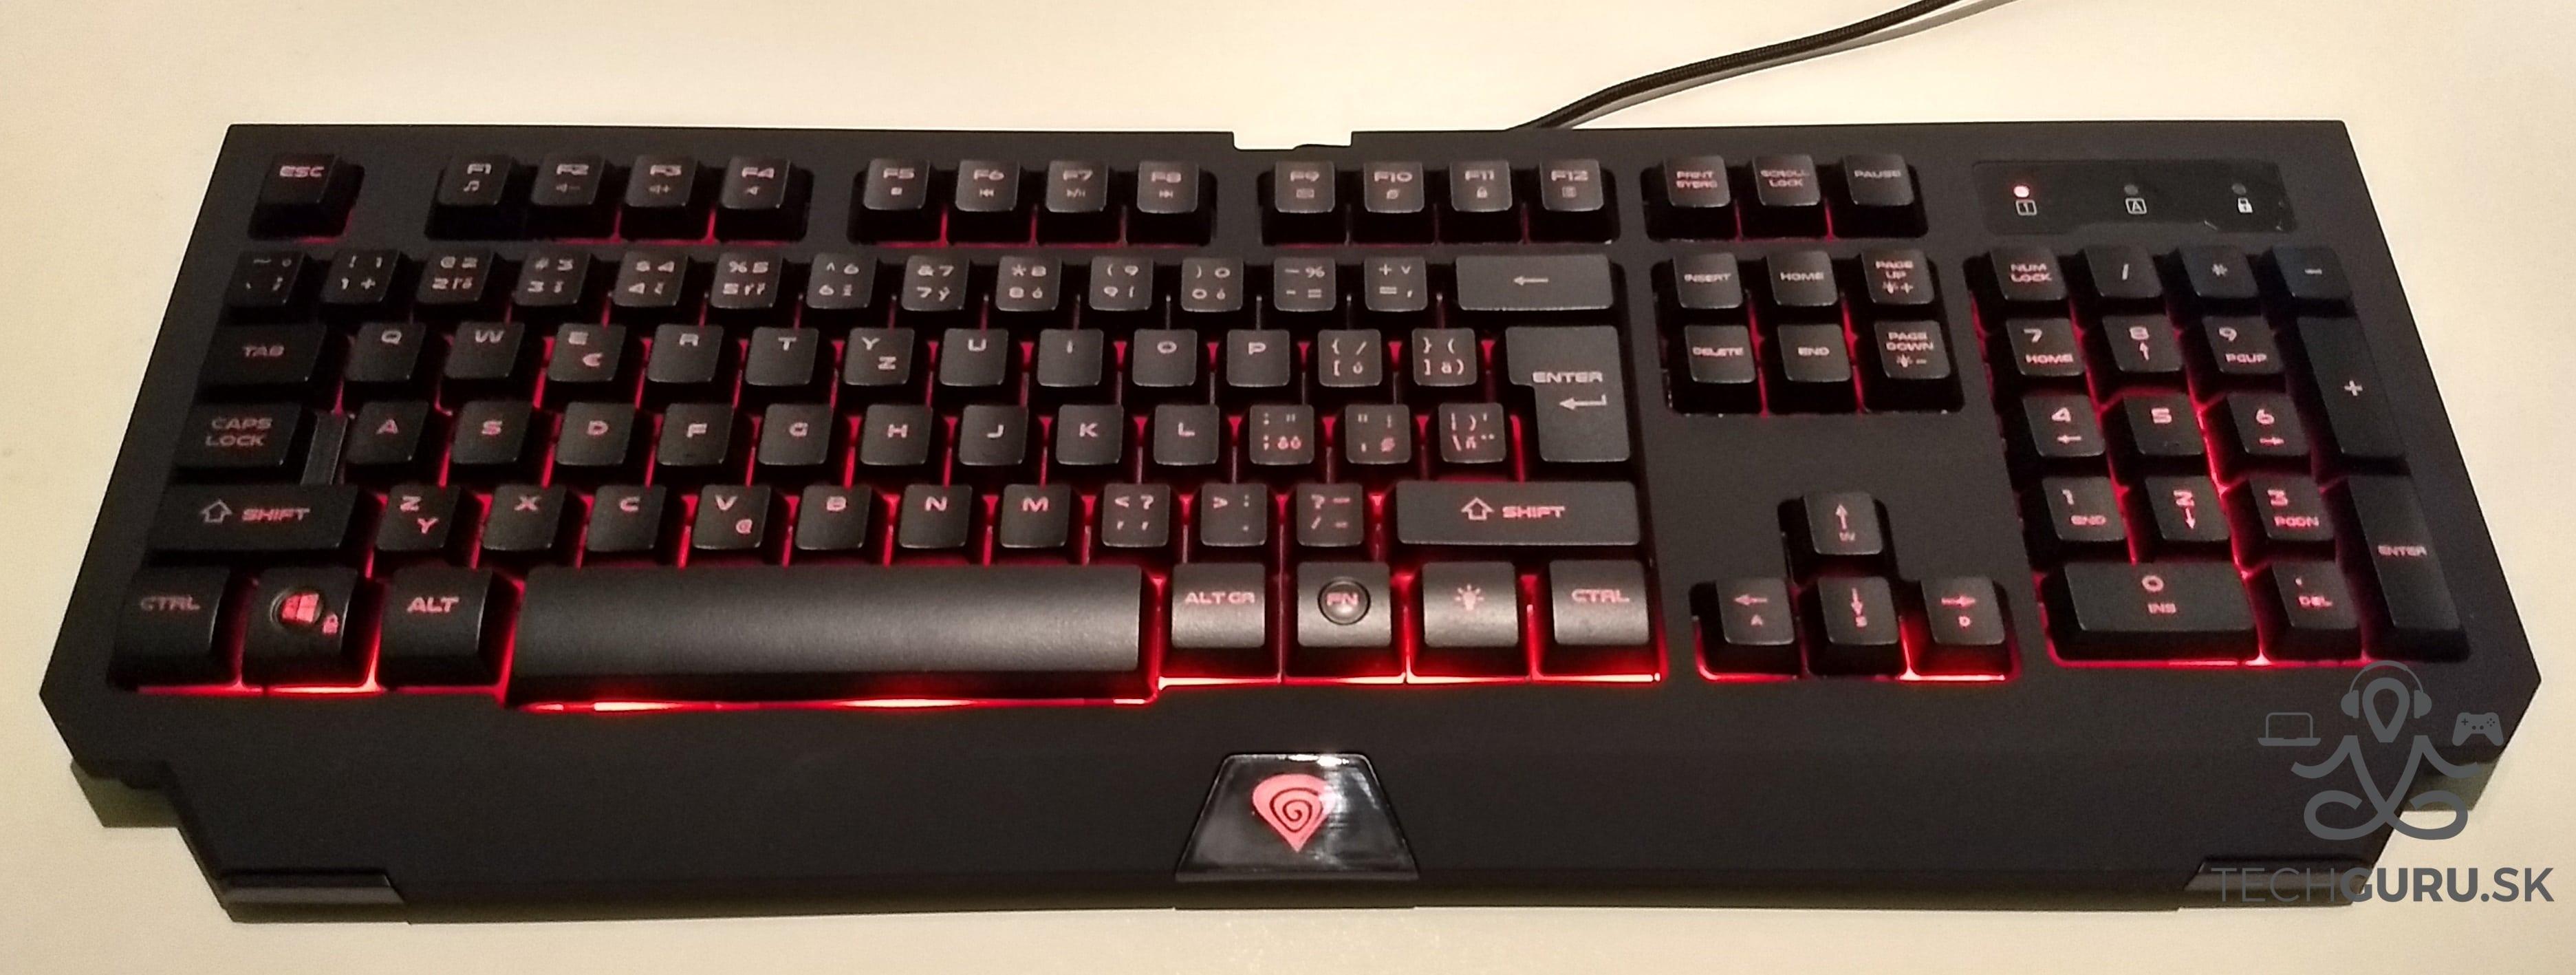 Genesis Cobalt 300 klávesnica podsvietenie 02